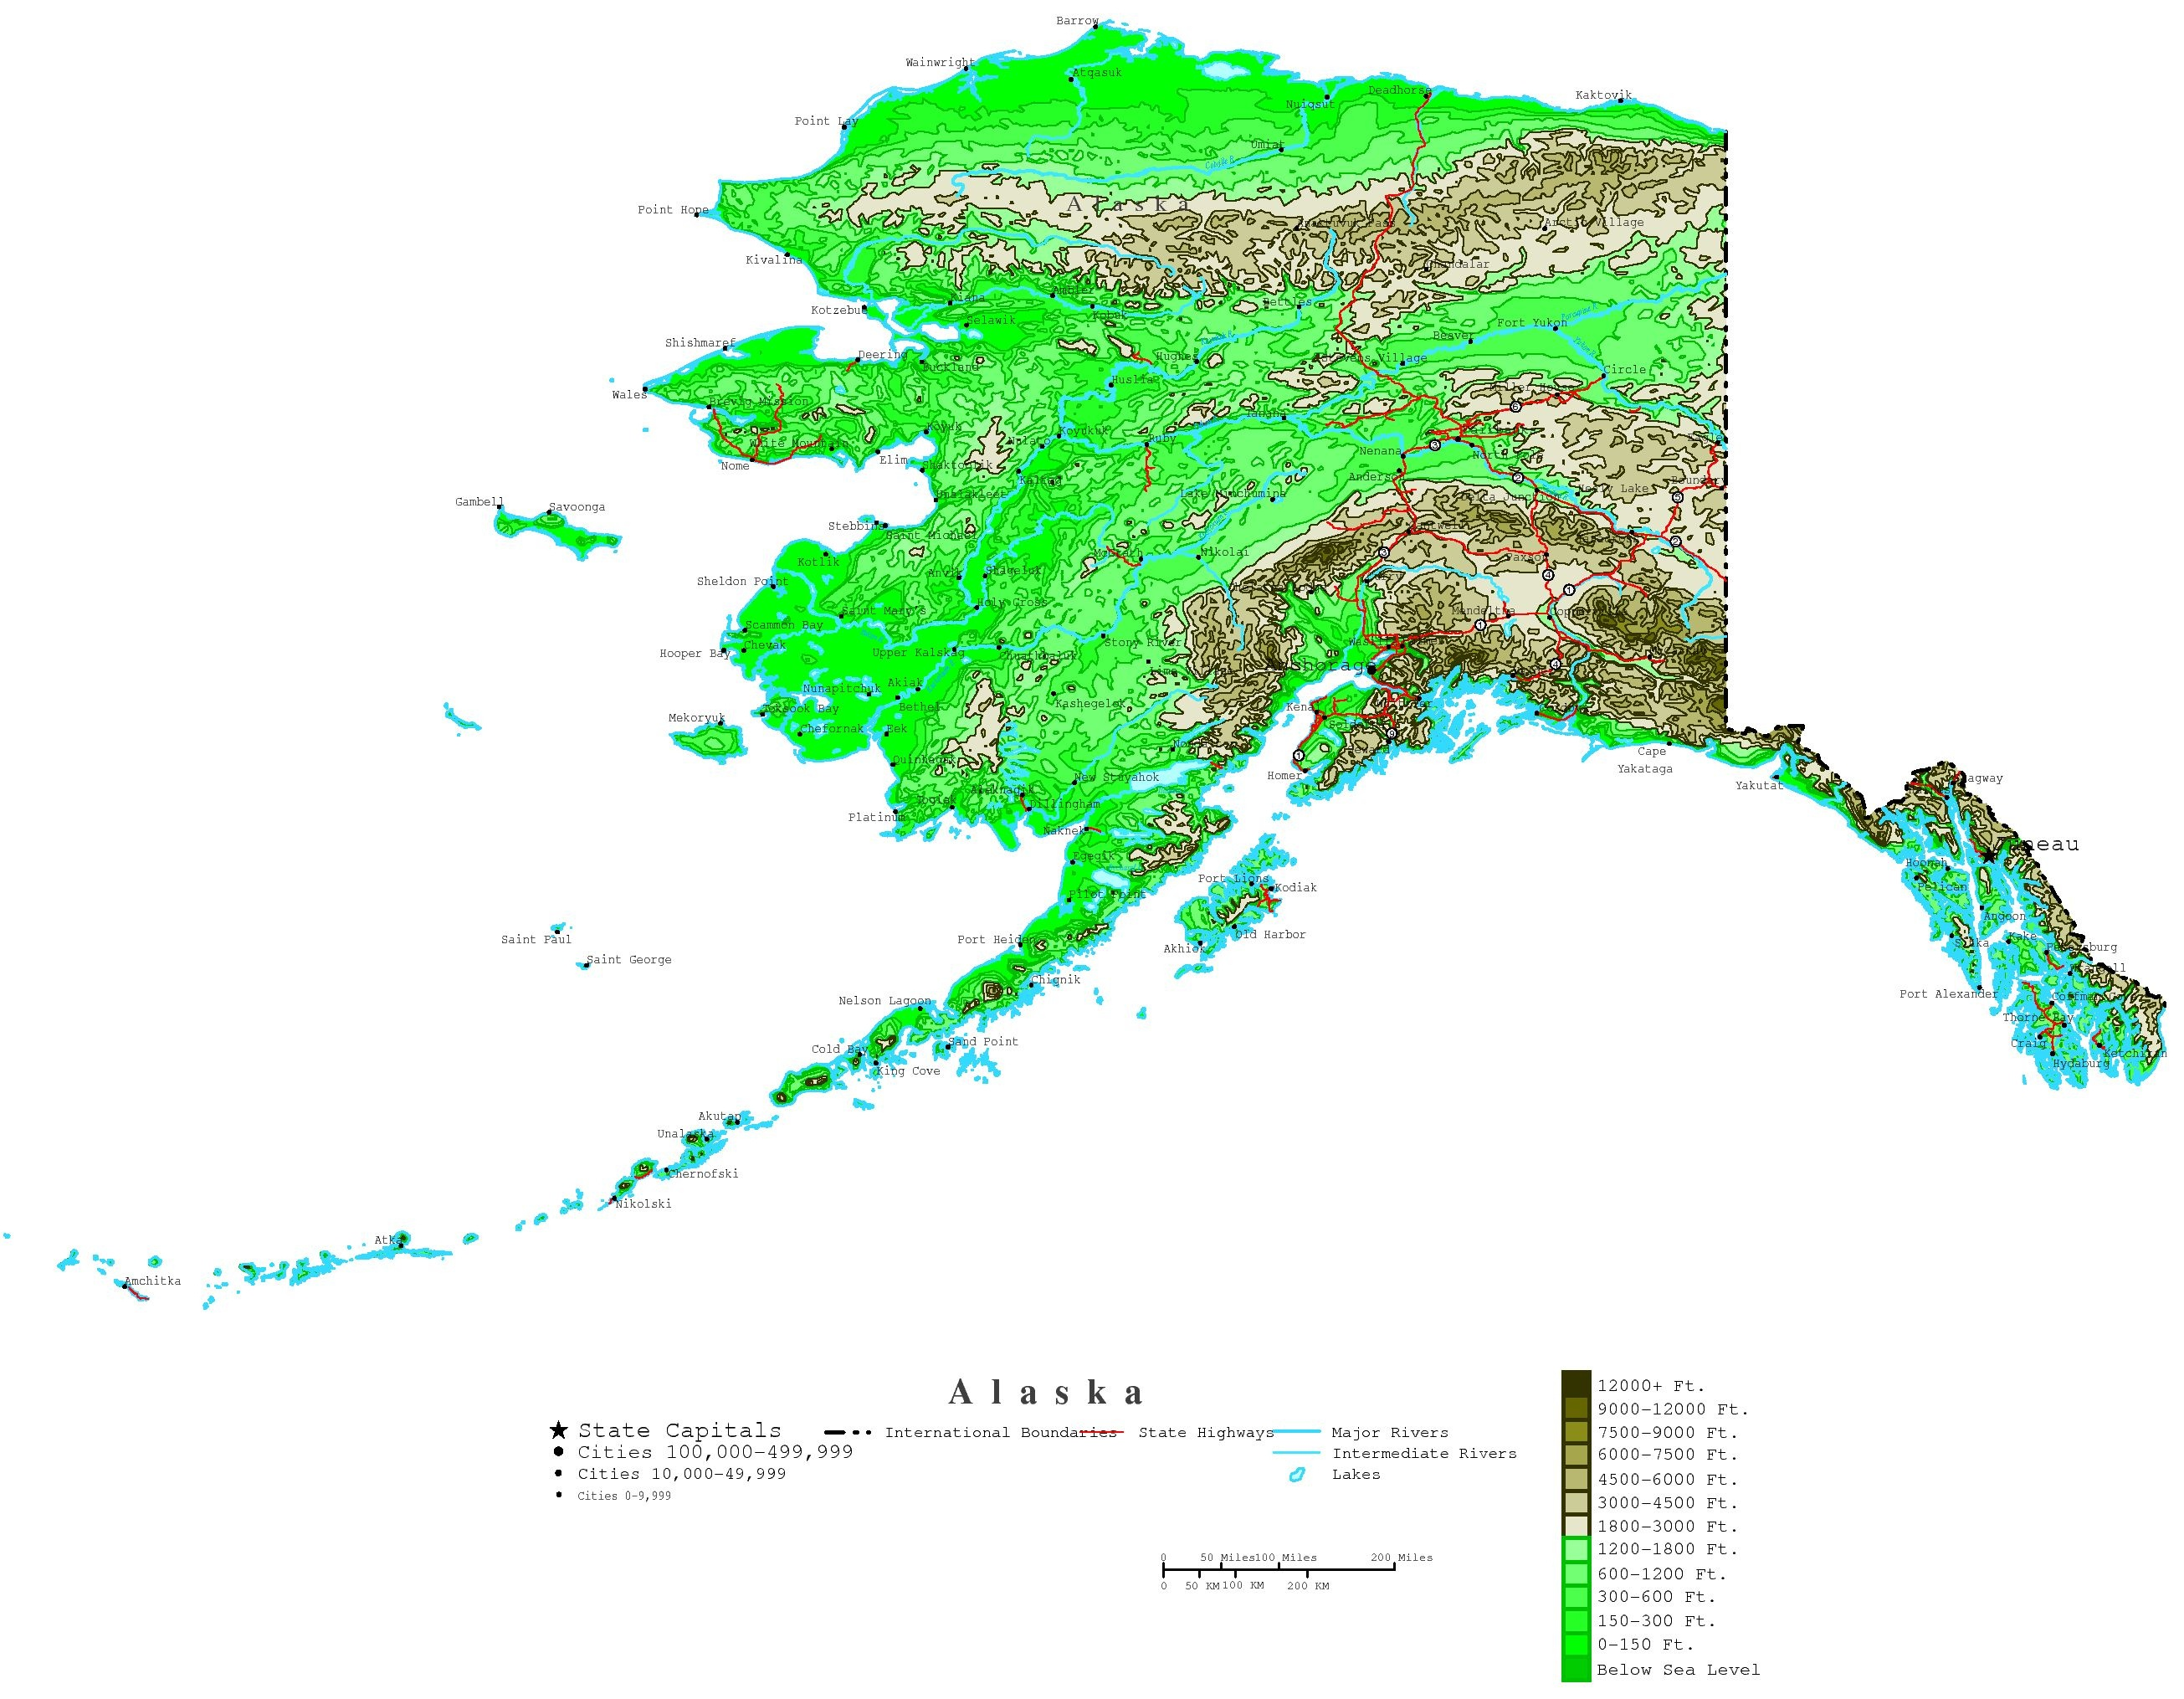 Printable Map Of Alaska And Travel Information   Download Free - Free Printable Pictures Of Alaska